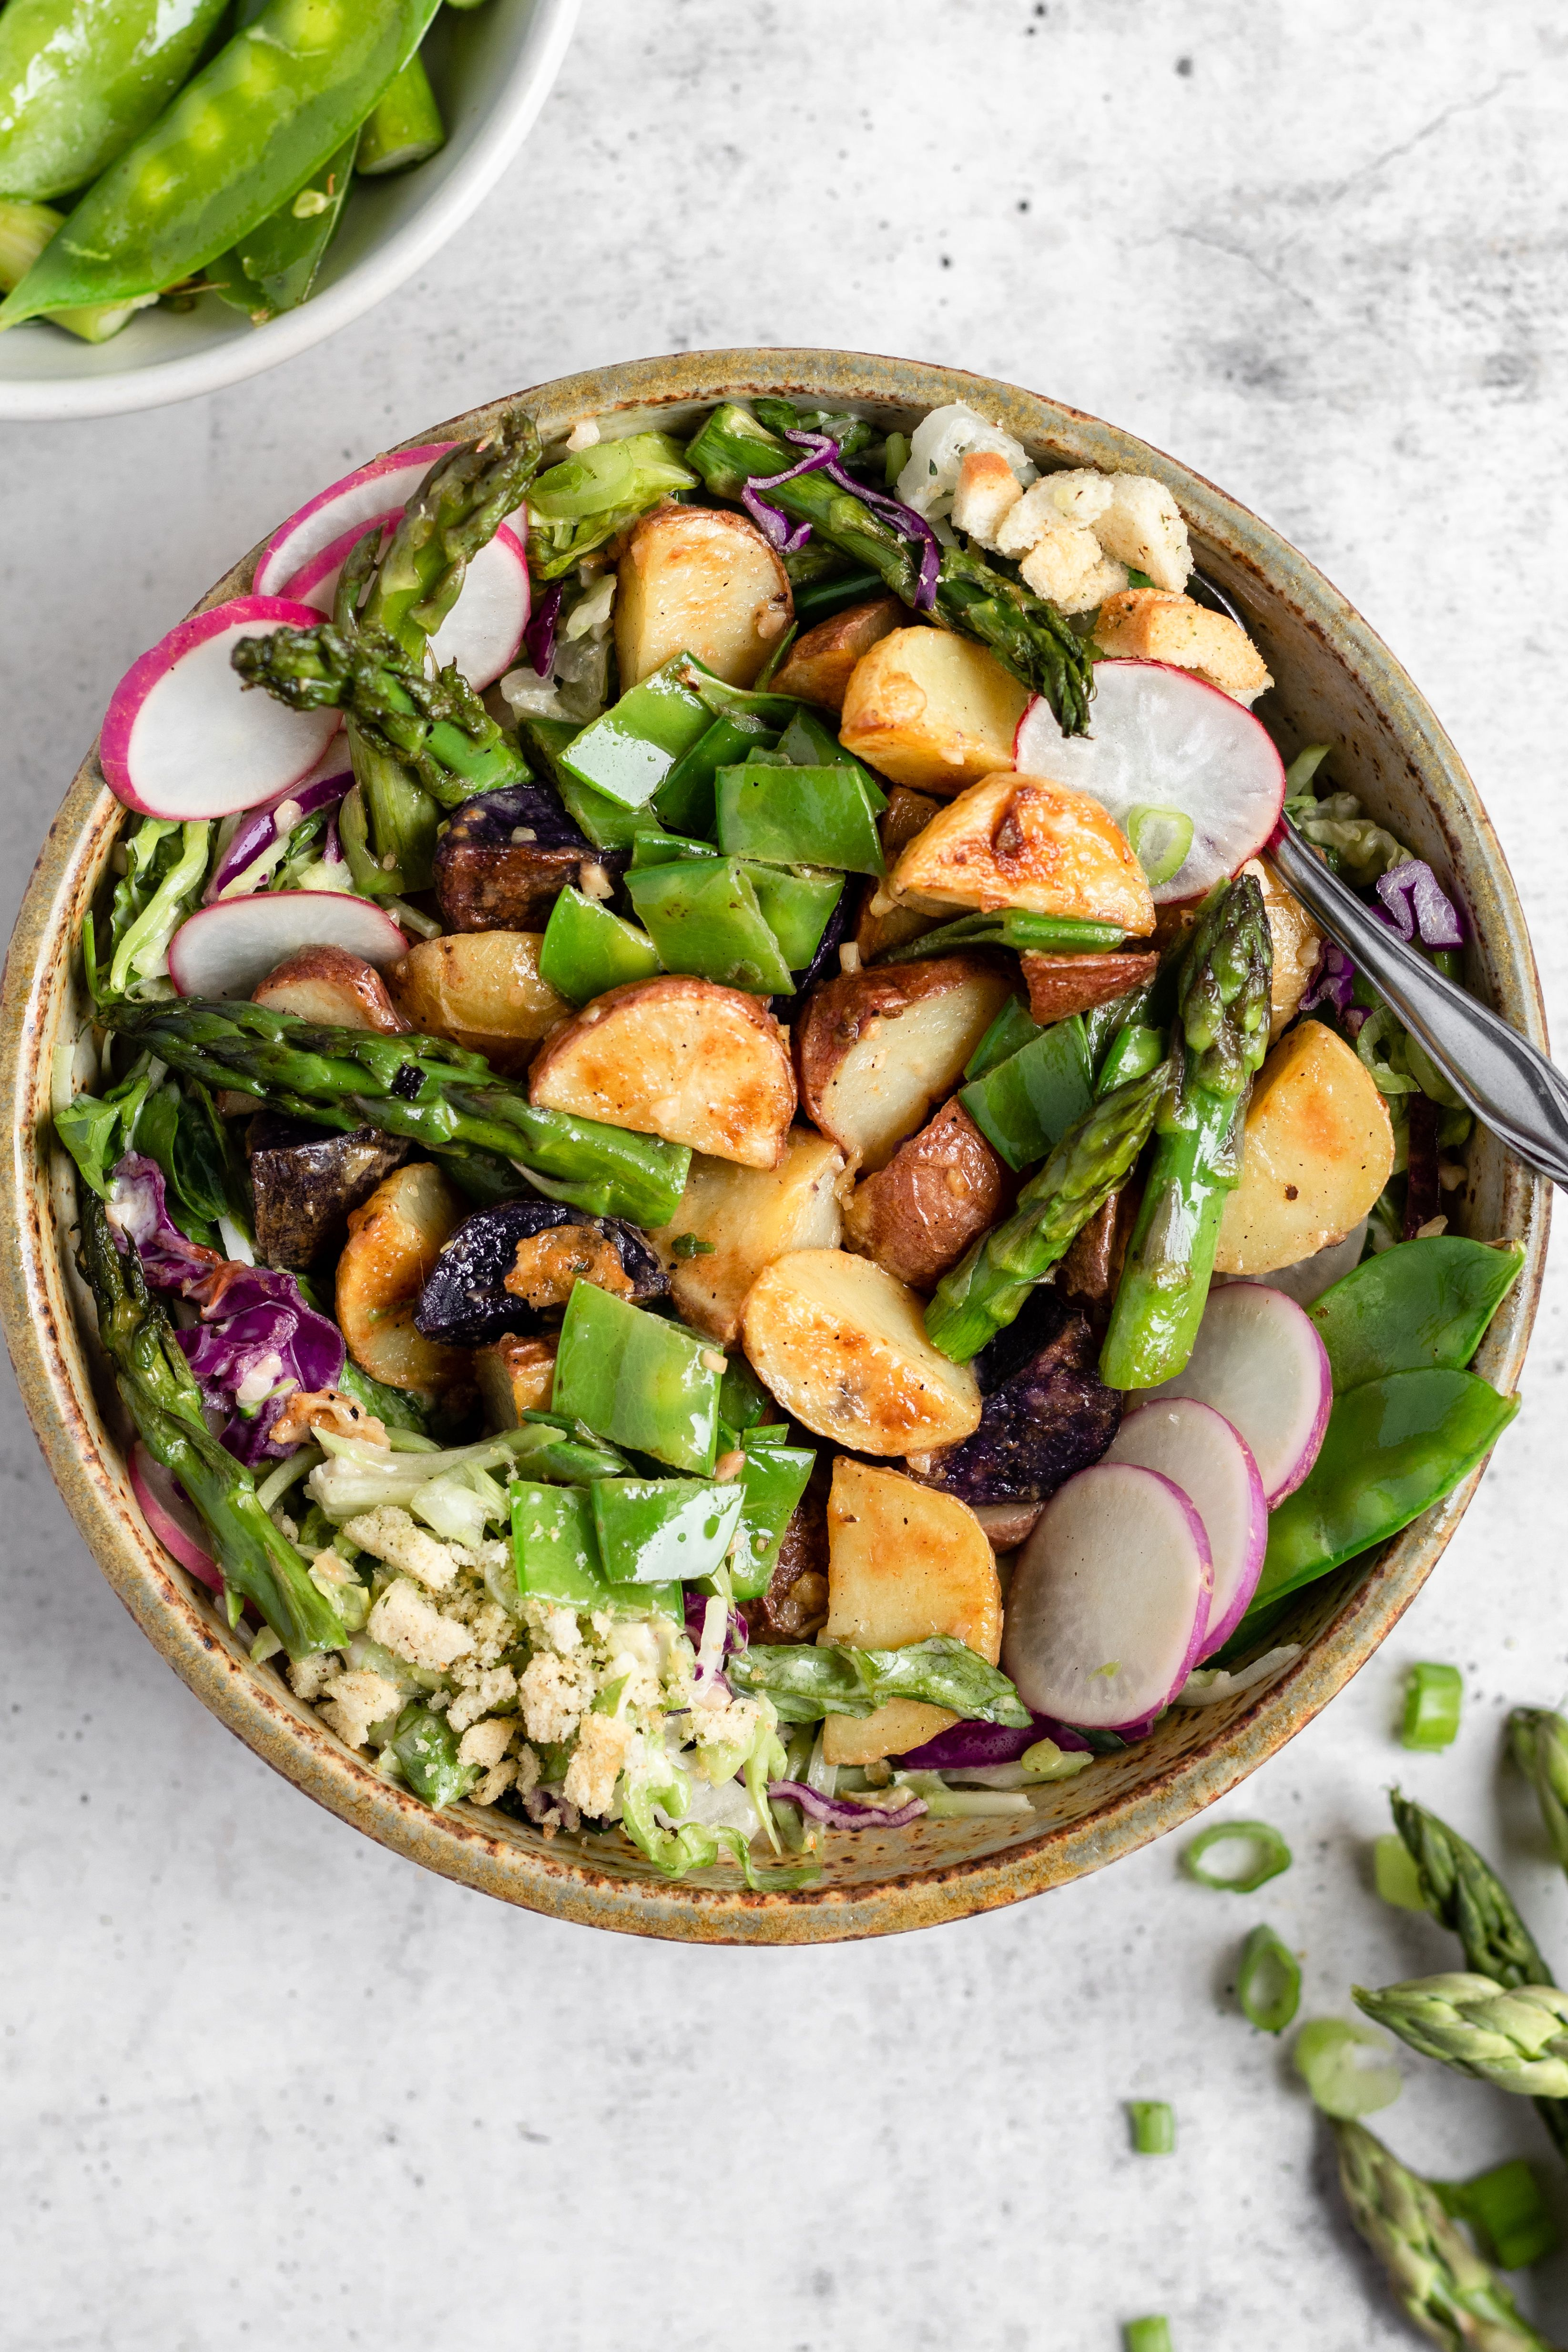 Warm Potato Salad with Roasted Garlic and Asparagus